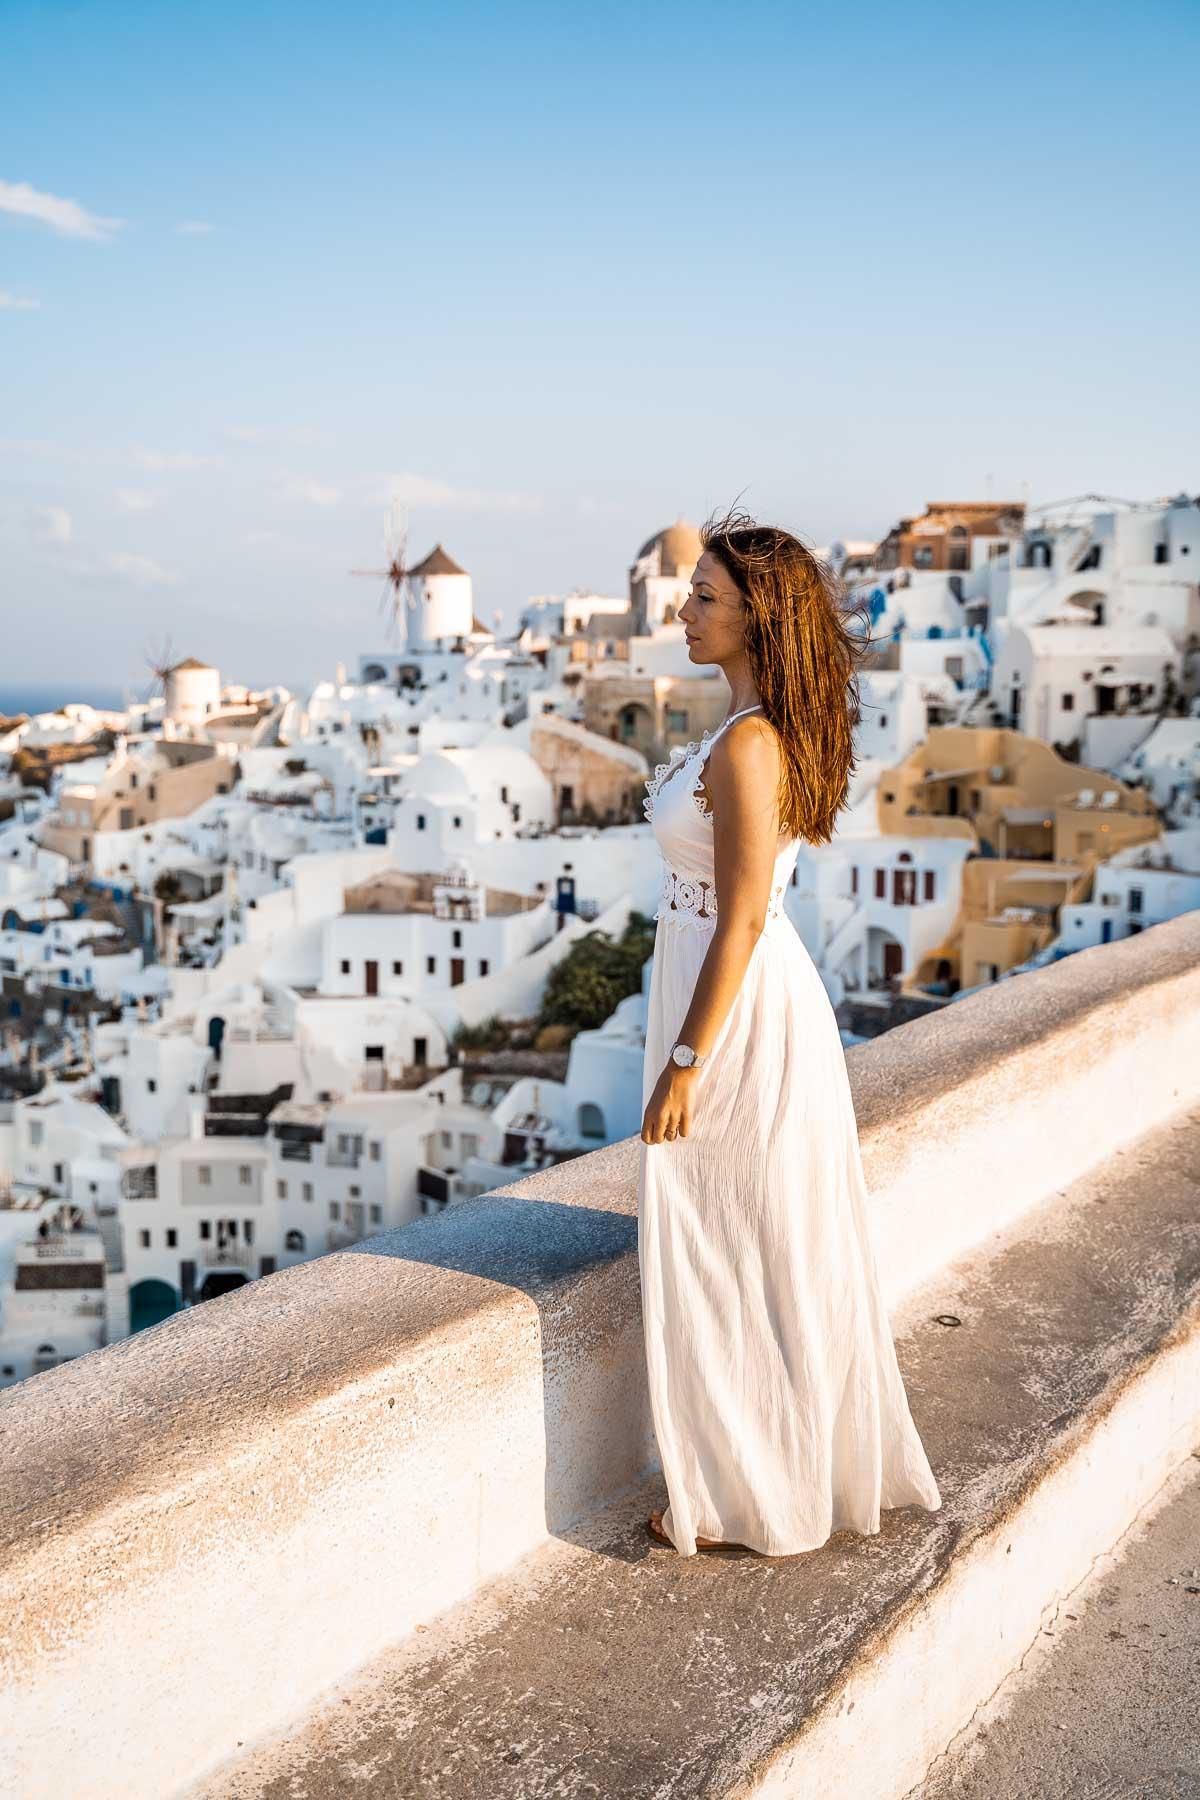 Girl in a white dress standing in the Oia Castle, Santorini